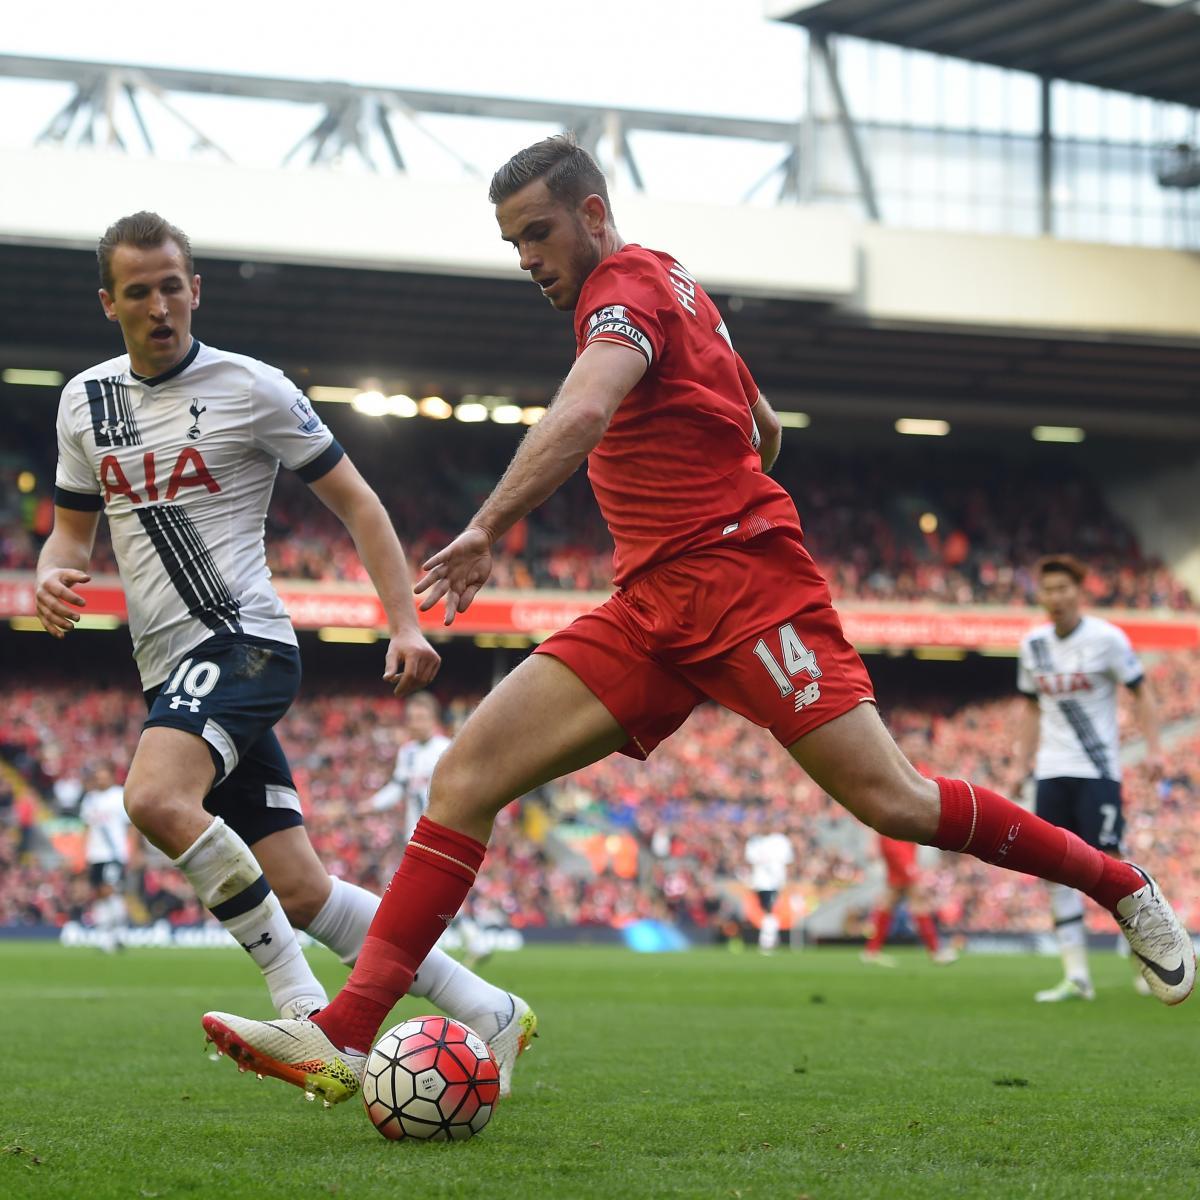 Liverpool Vs. Tottenham: Live Score, Highlights From